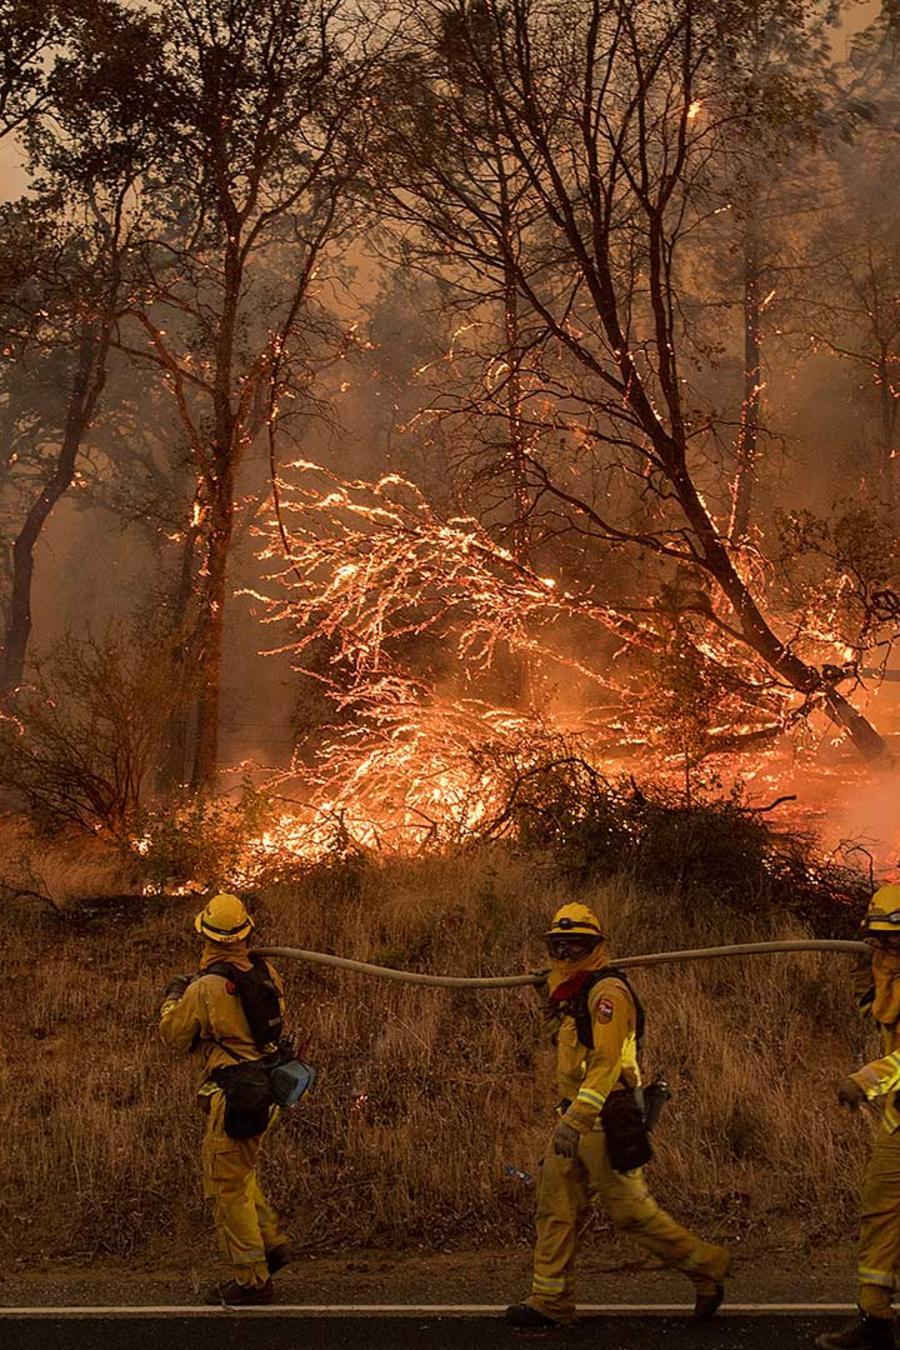 Bomberos combaten incendio forestal en California